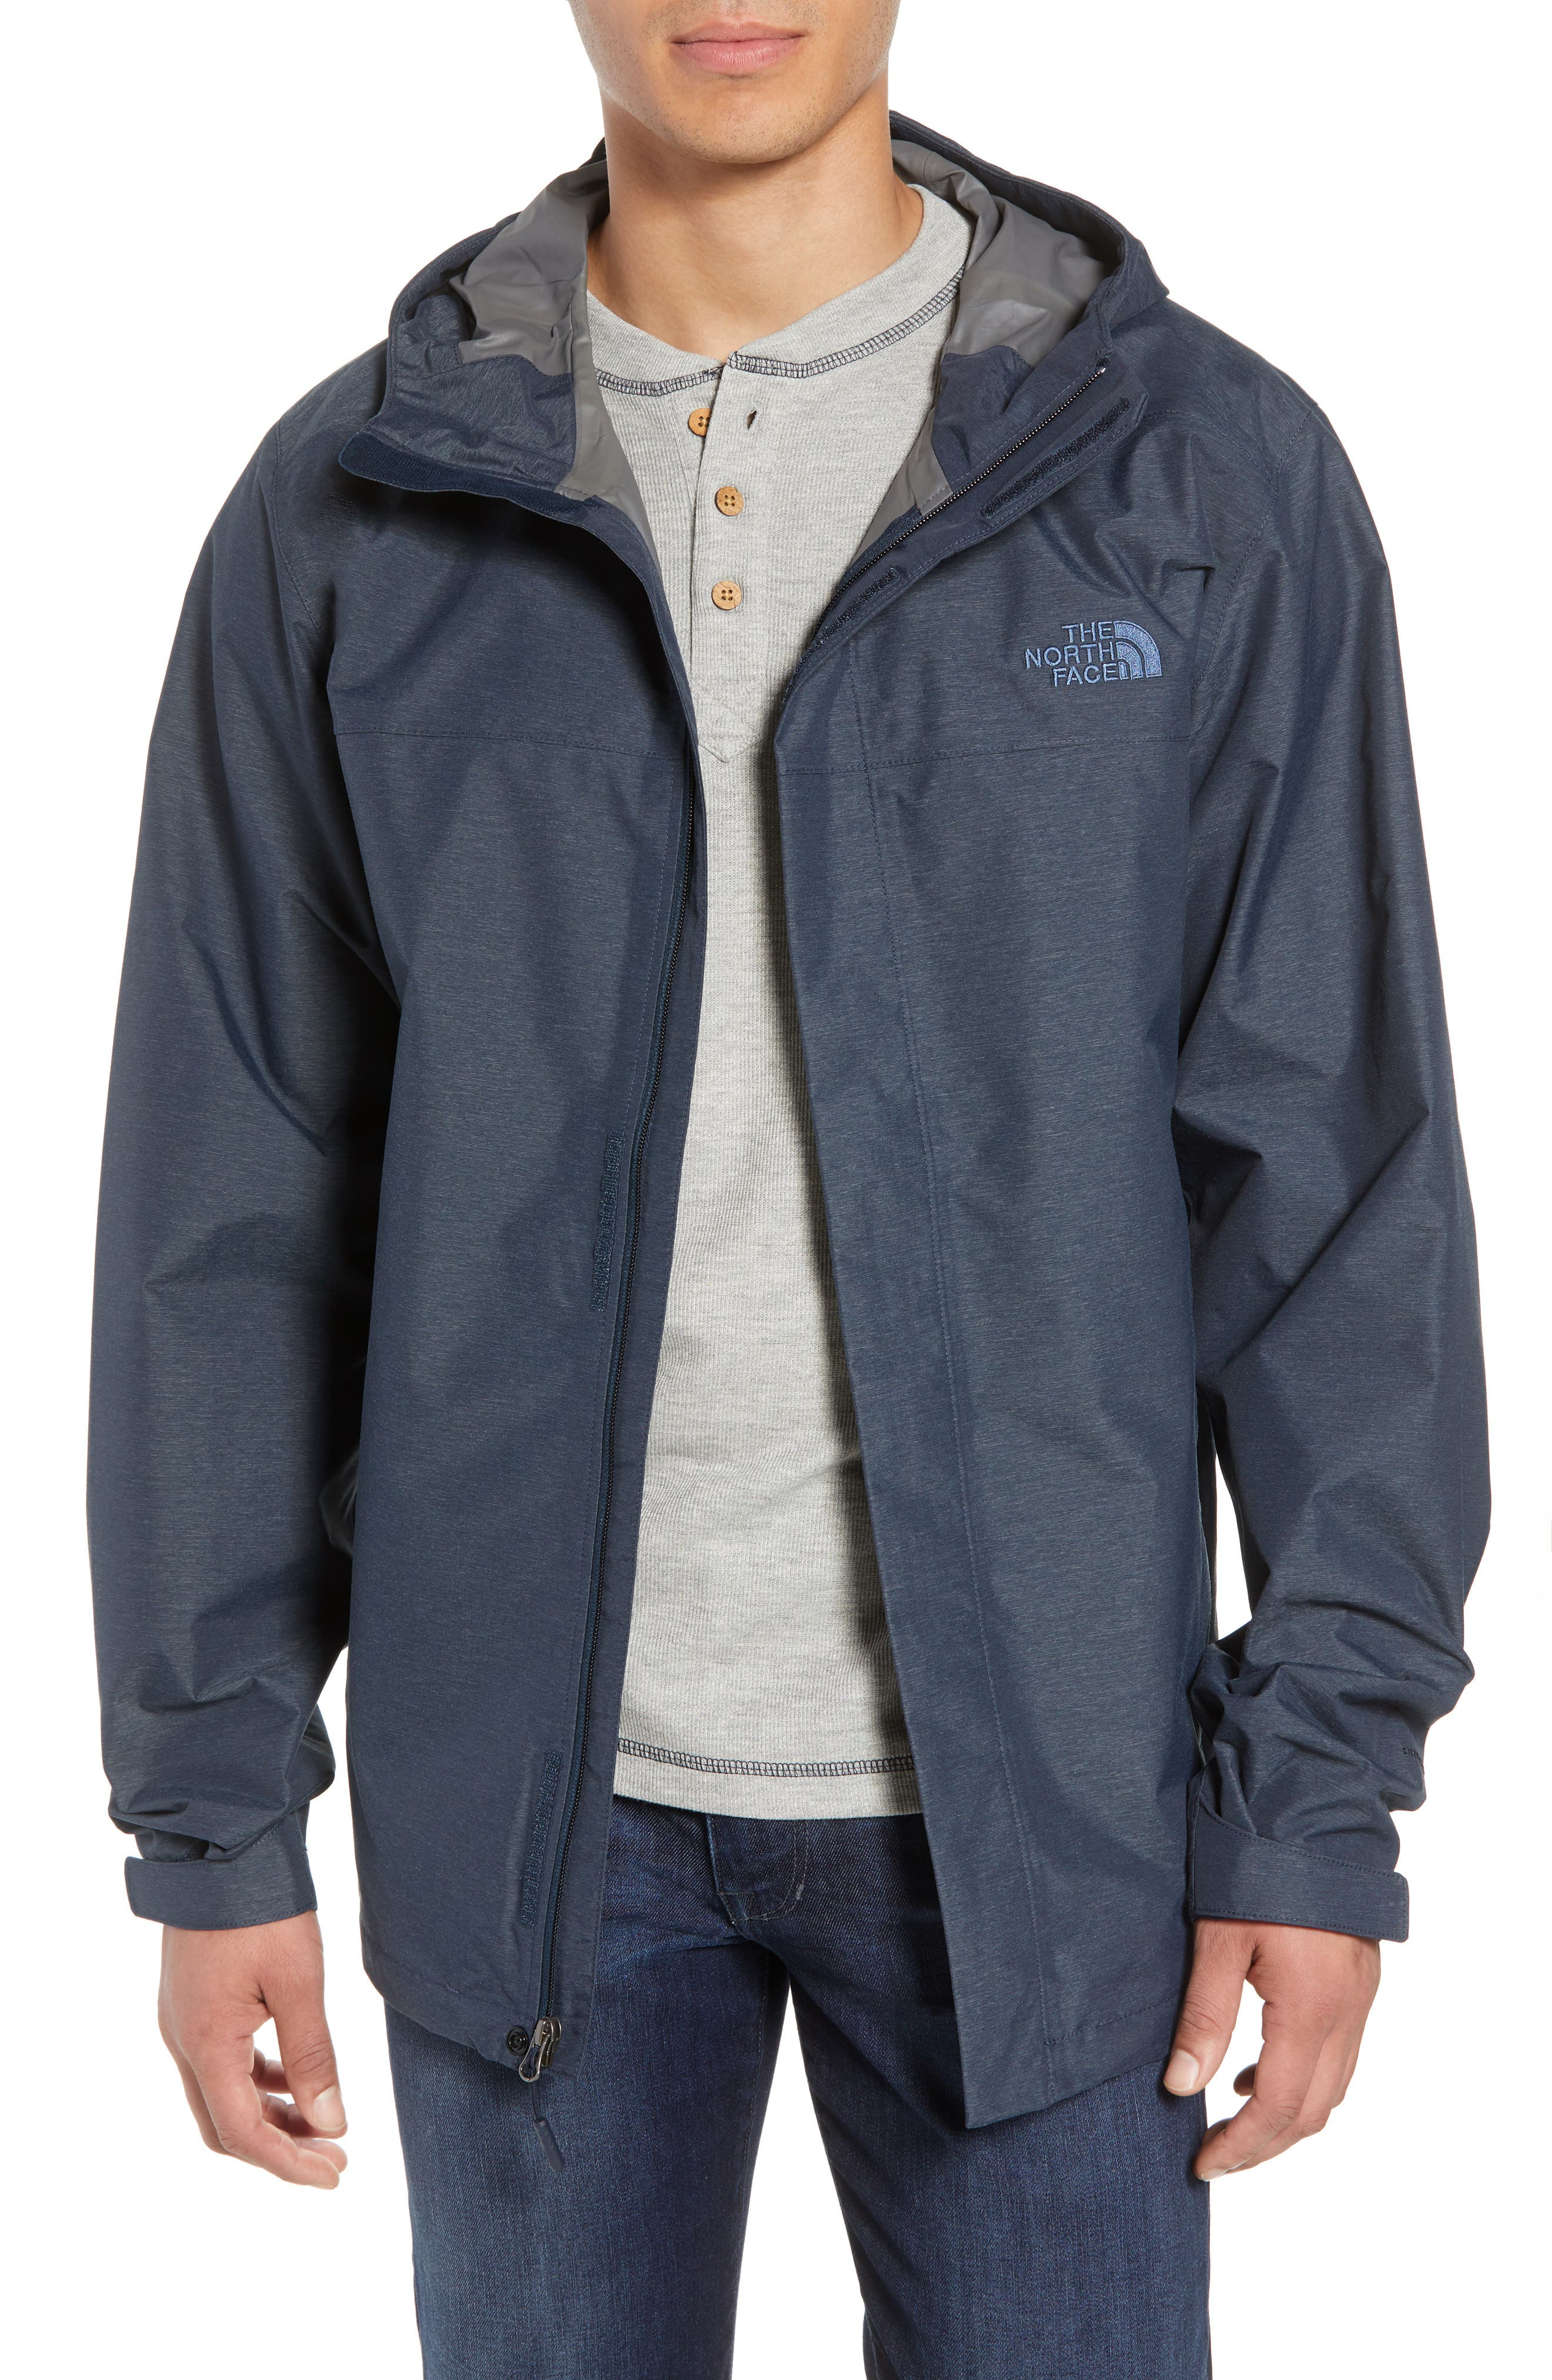 Venture 2 Waterproof Jacket,                             Main thumbnail 1, color,                             URBAN NAVY HEATHER